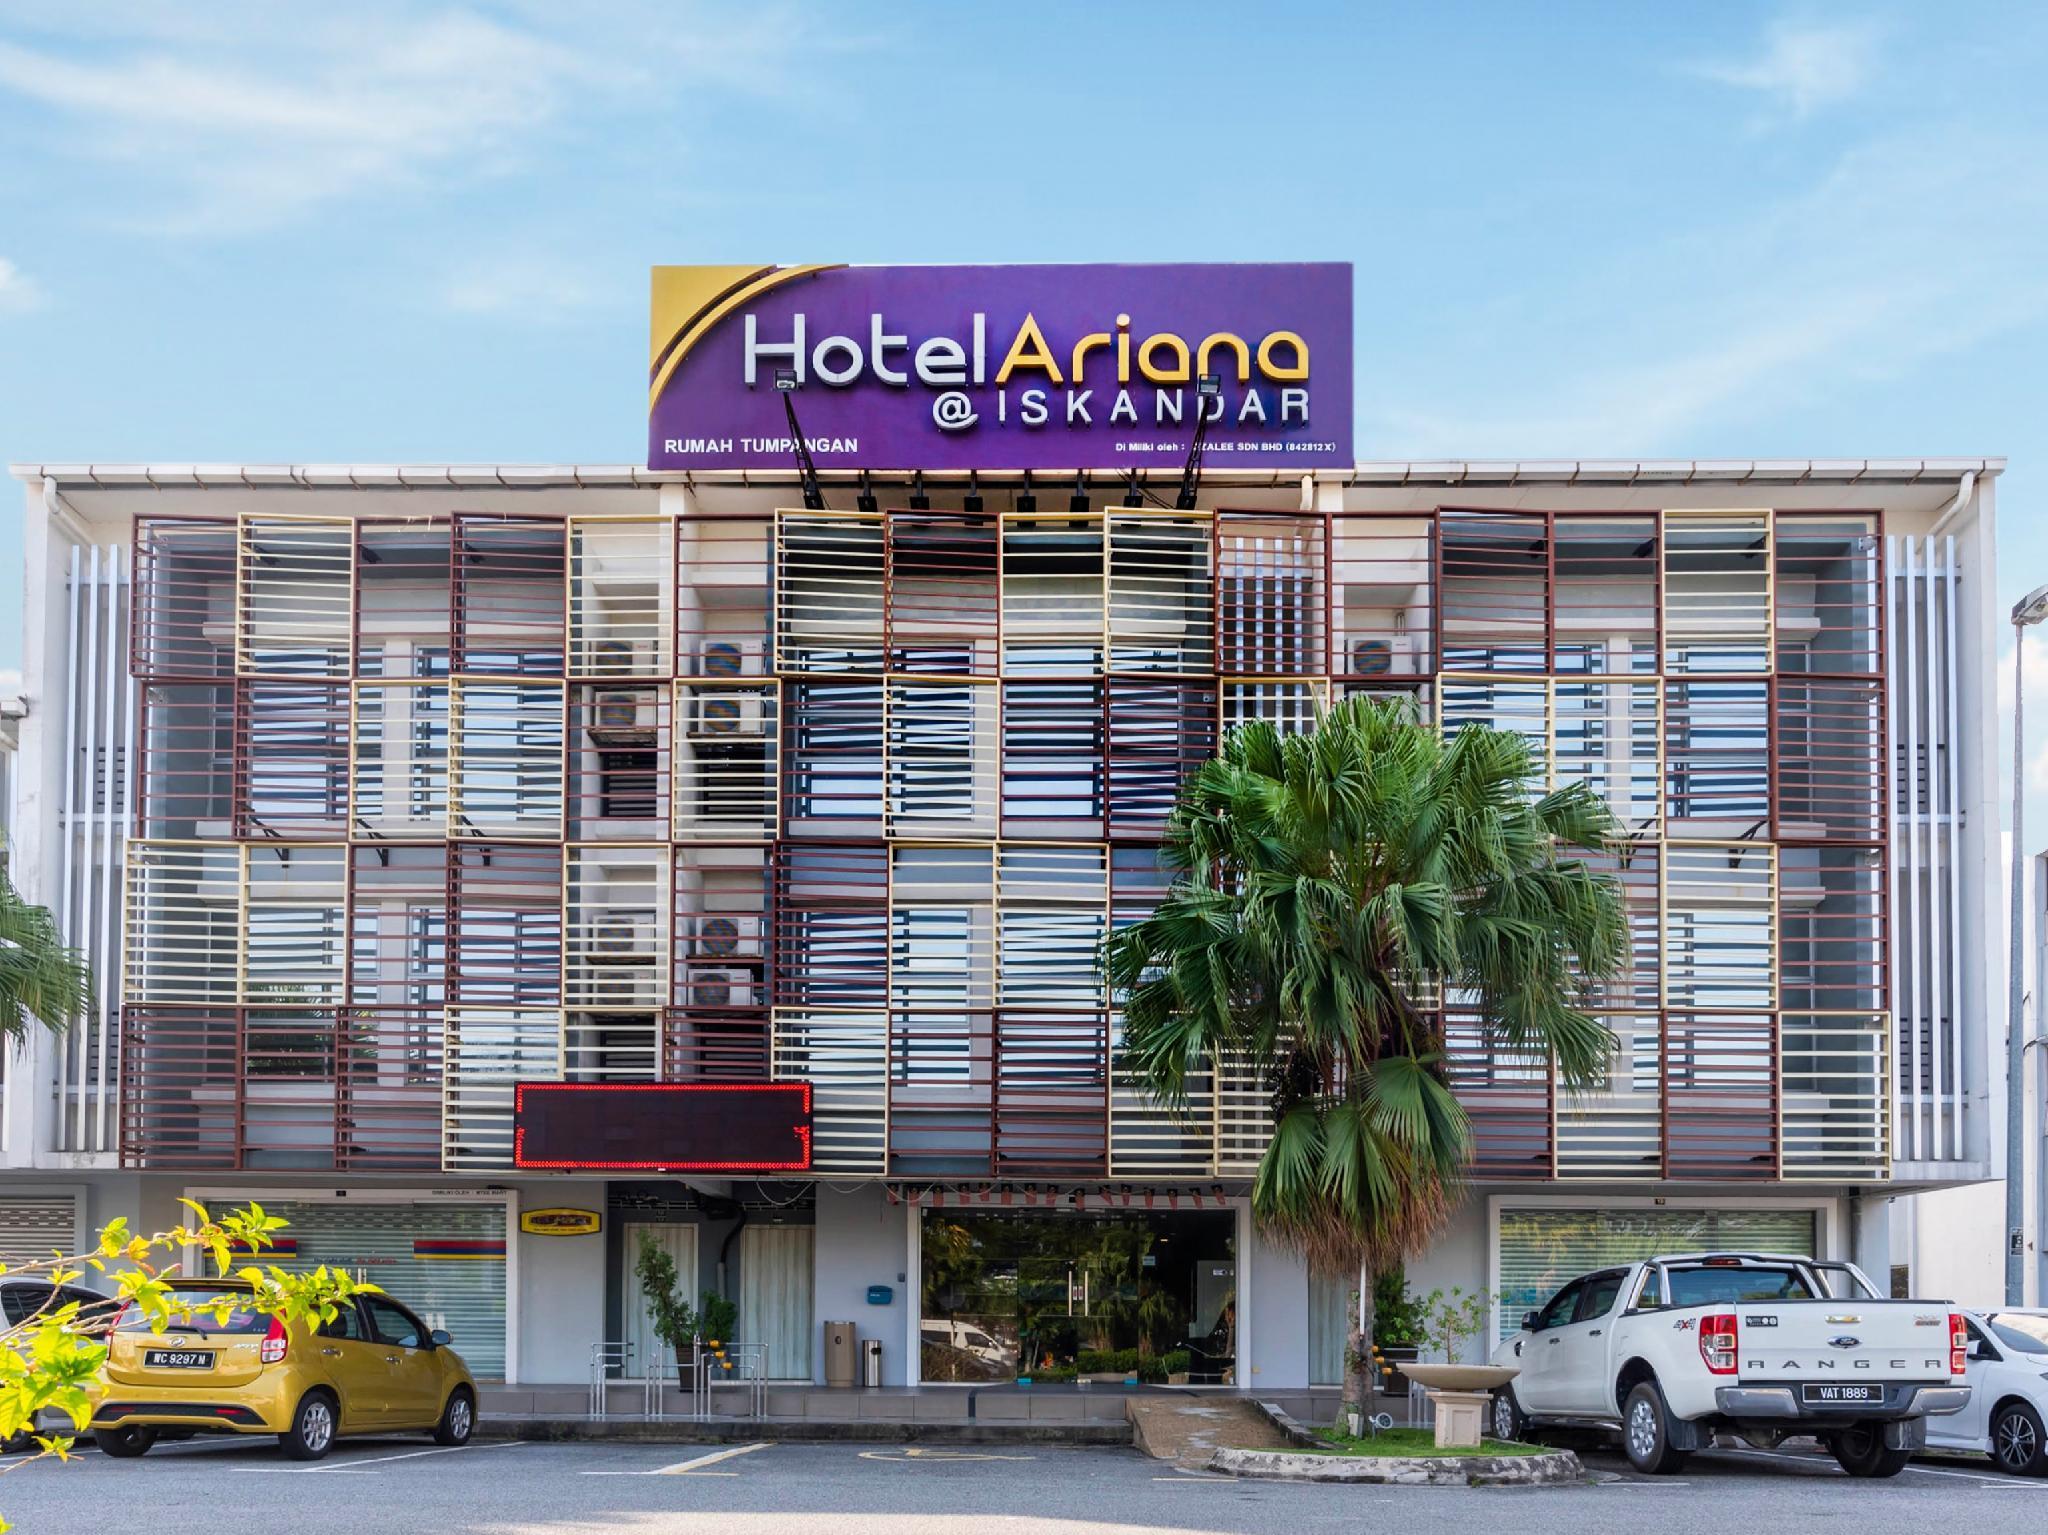 OYO 898 Hotel Ariana Iskandar, Johor Bahru